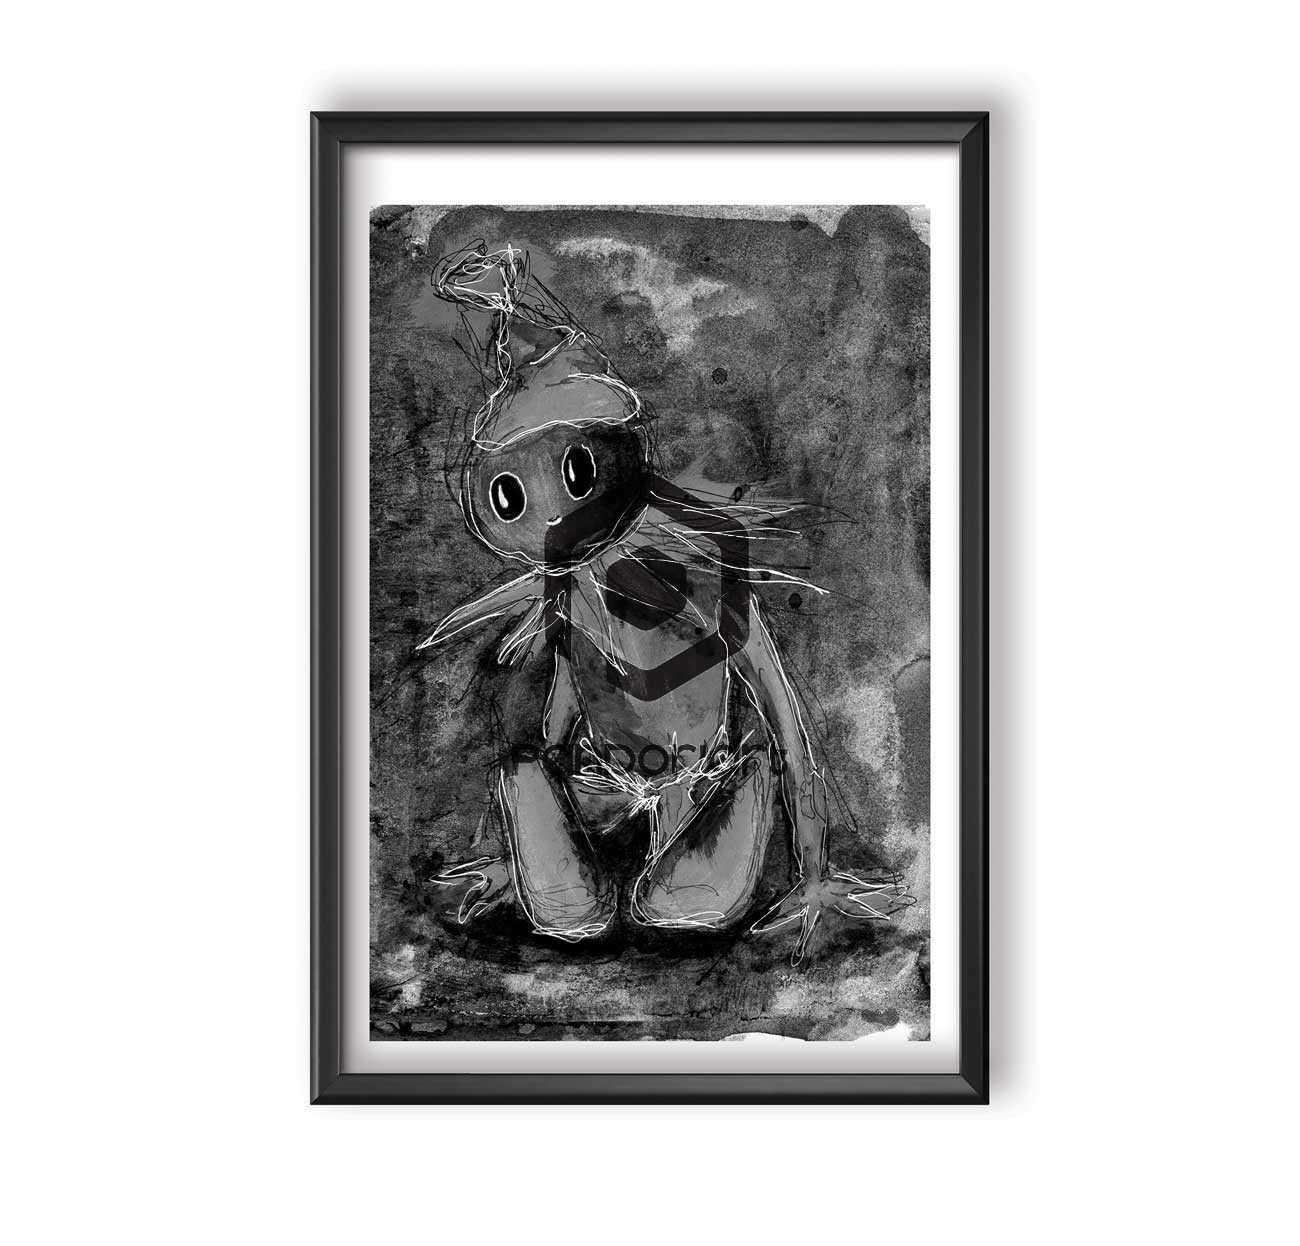 Forgotten-Toys-#1-Clement-Berle-cadre